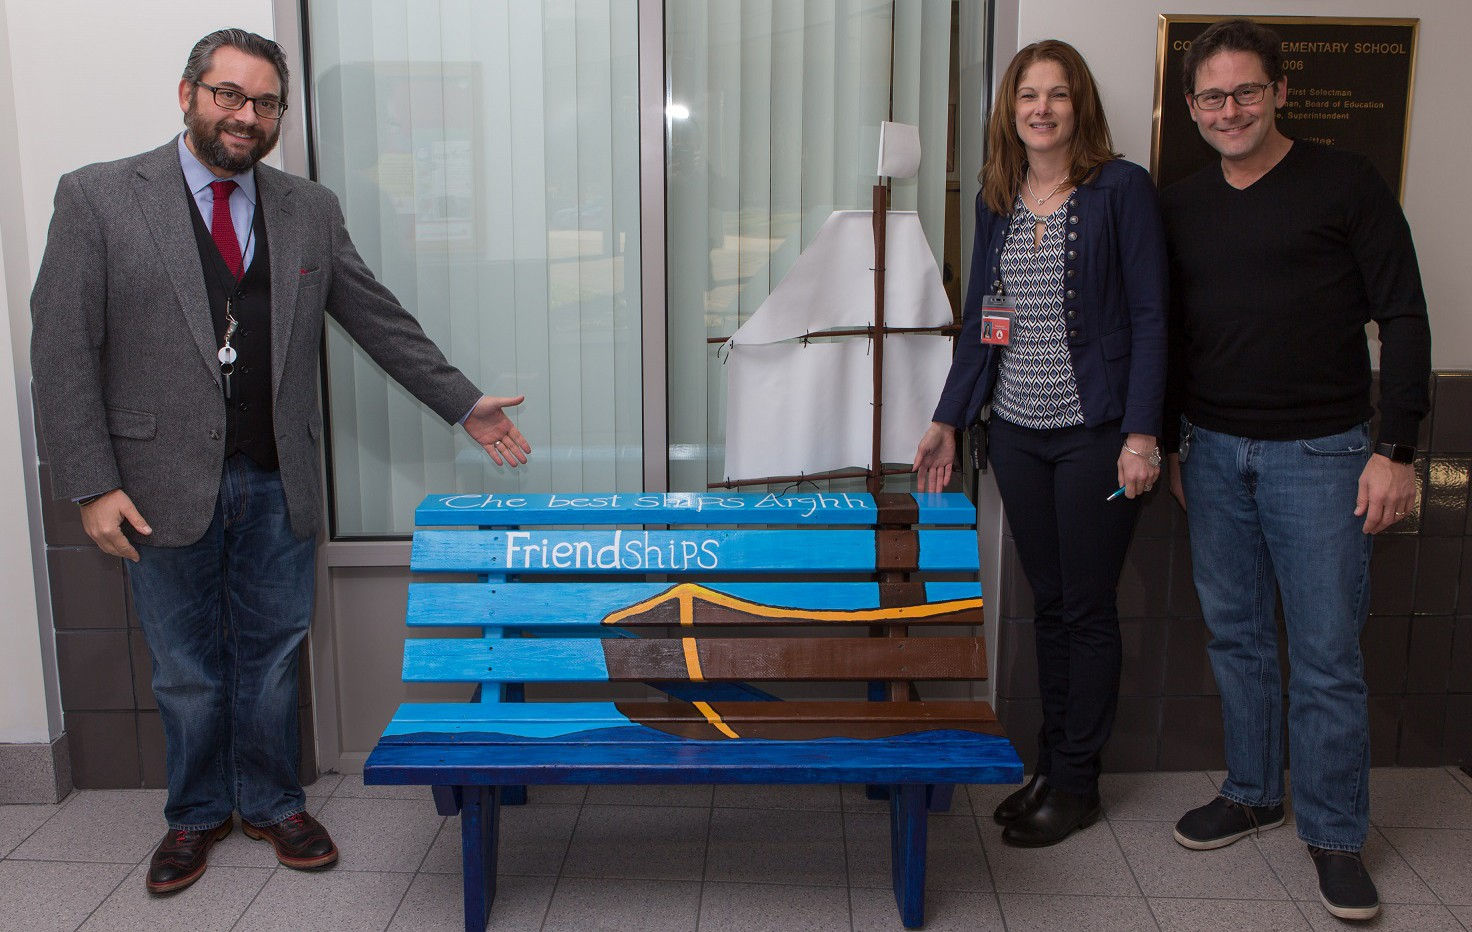 buddy bench for friendship